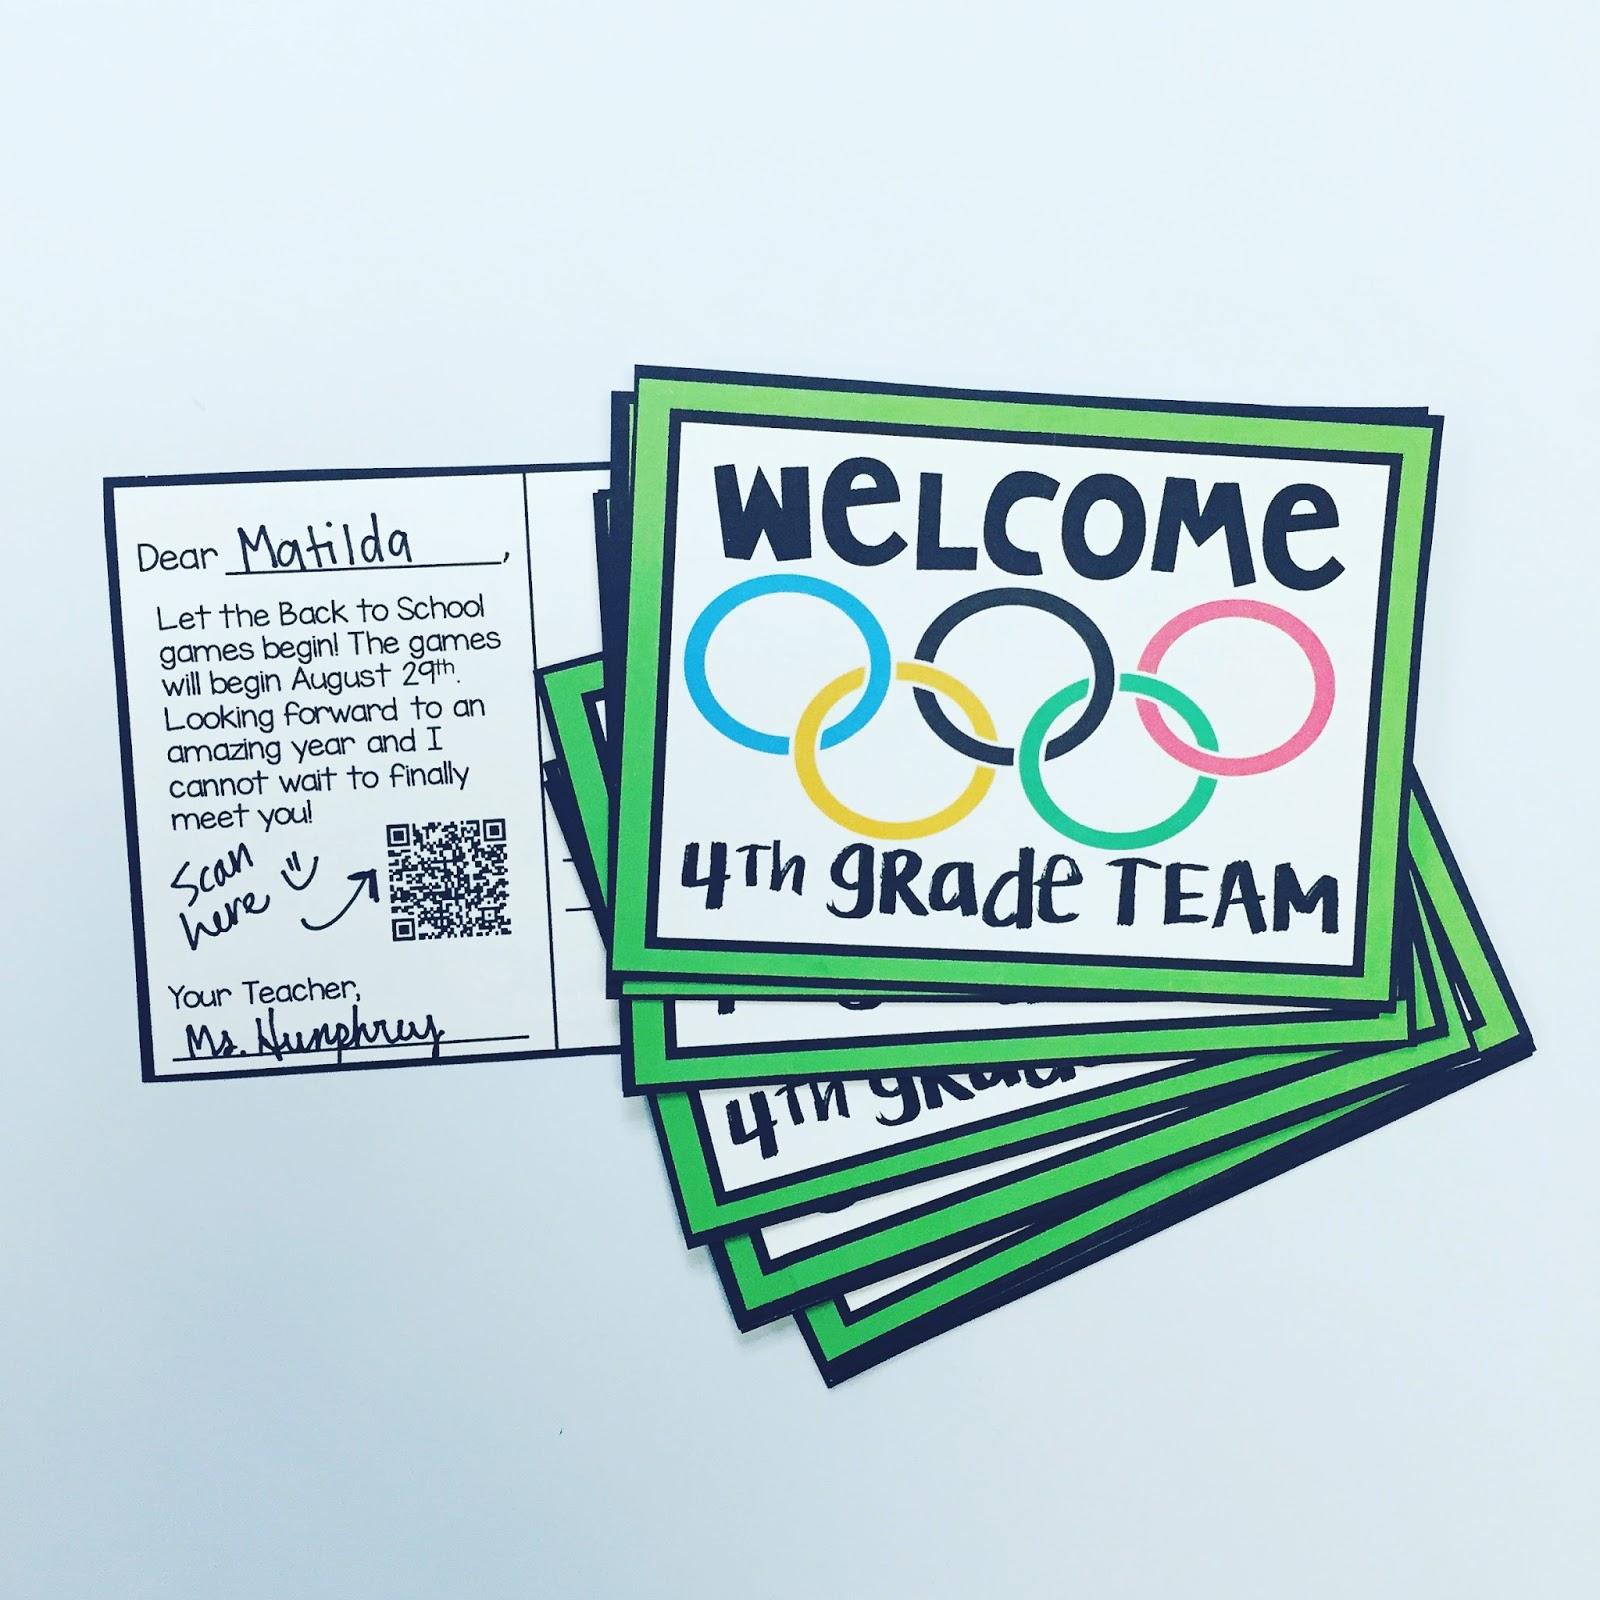 Teaching And So Fourth Editable Postcard Templates - Editable postcard template